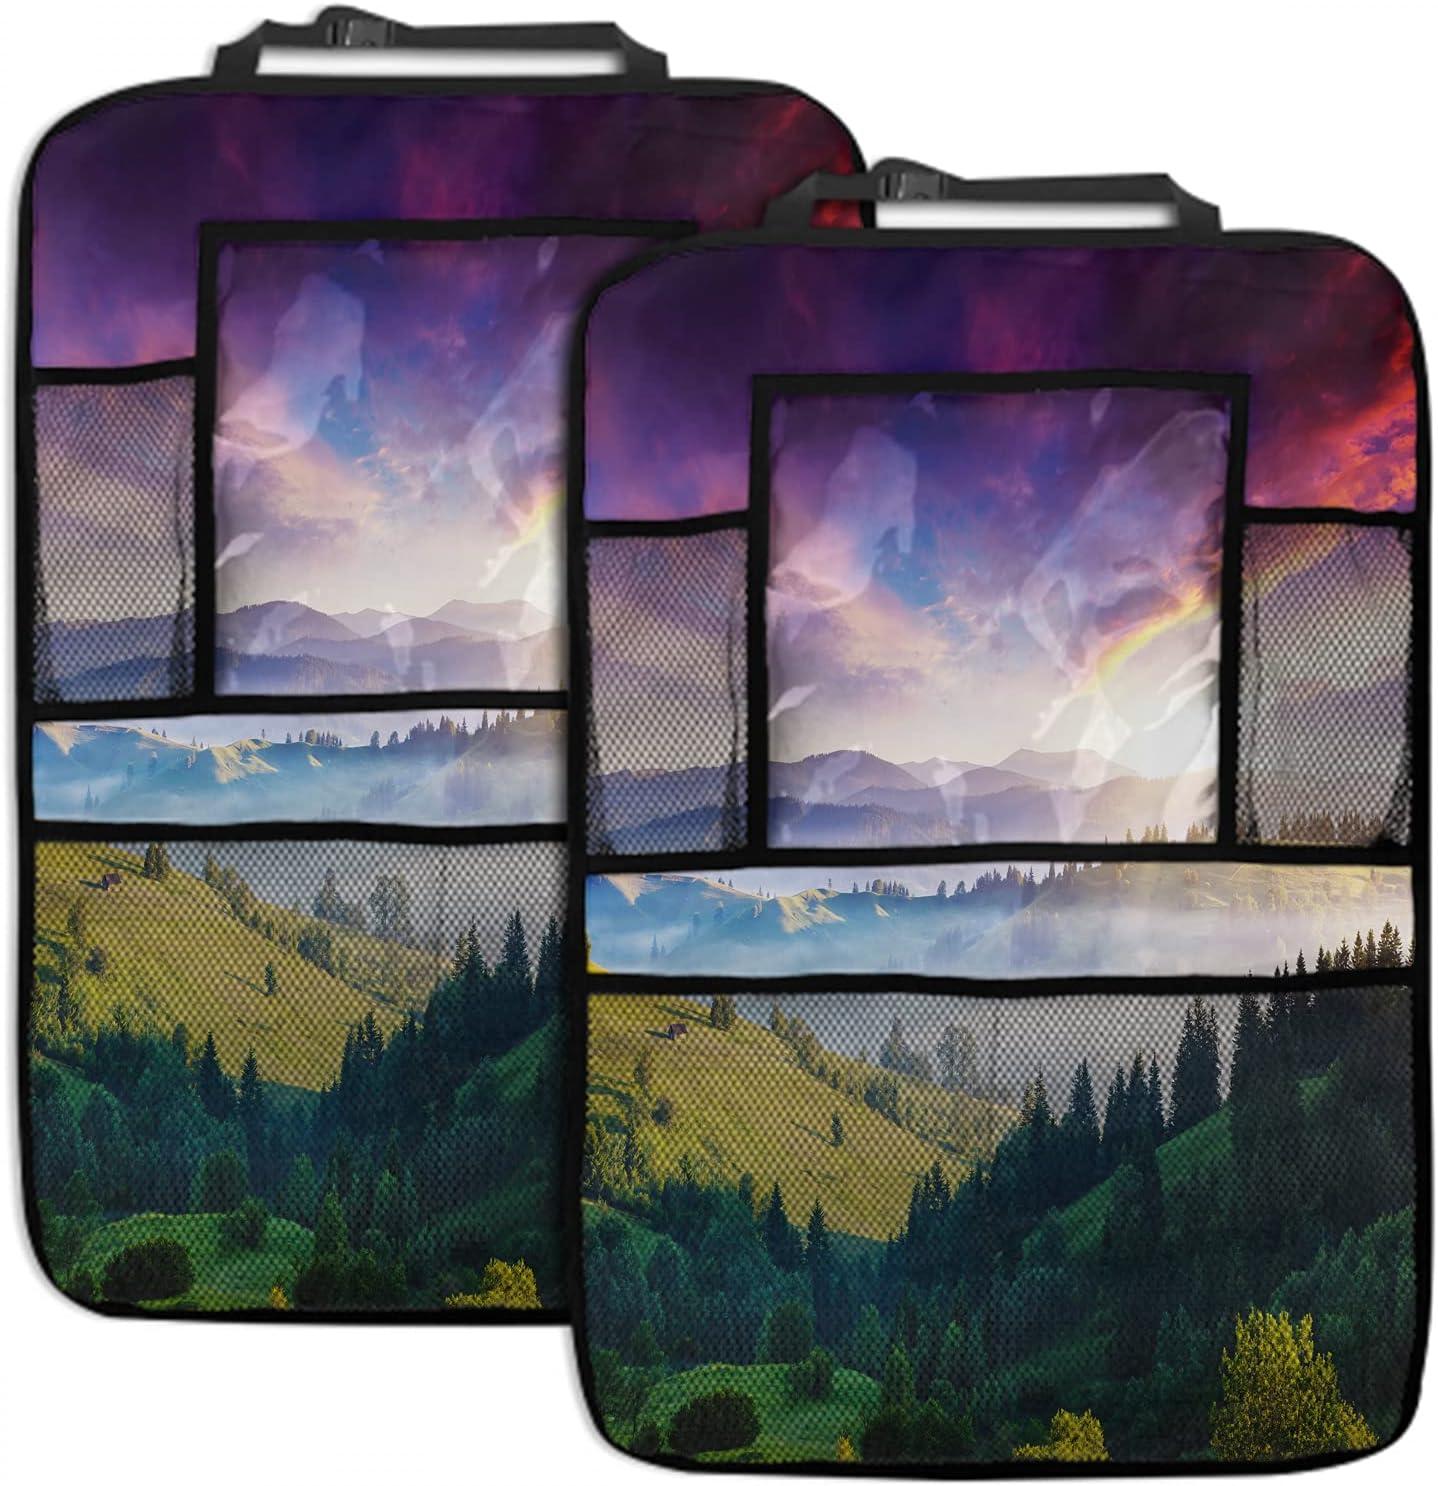 EKOBLA Mountain Landscape 2 Pack Car Branded goods 19x27.5 Latest item Organizer Inch Seat